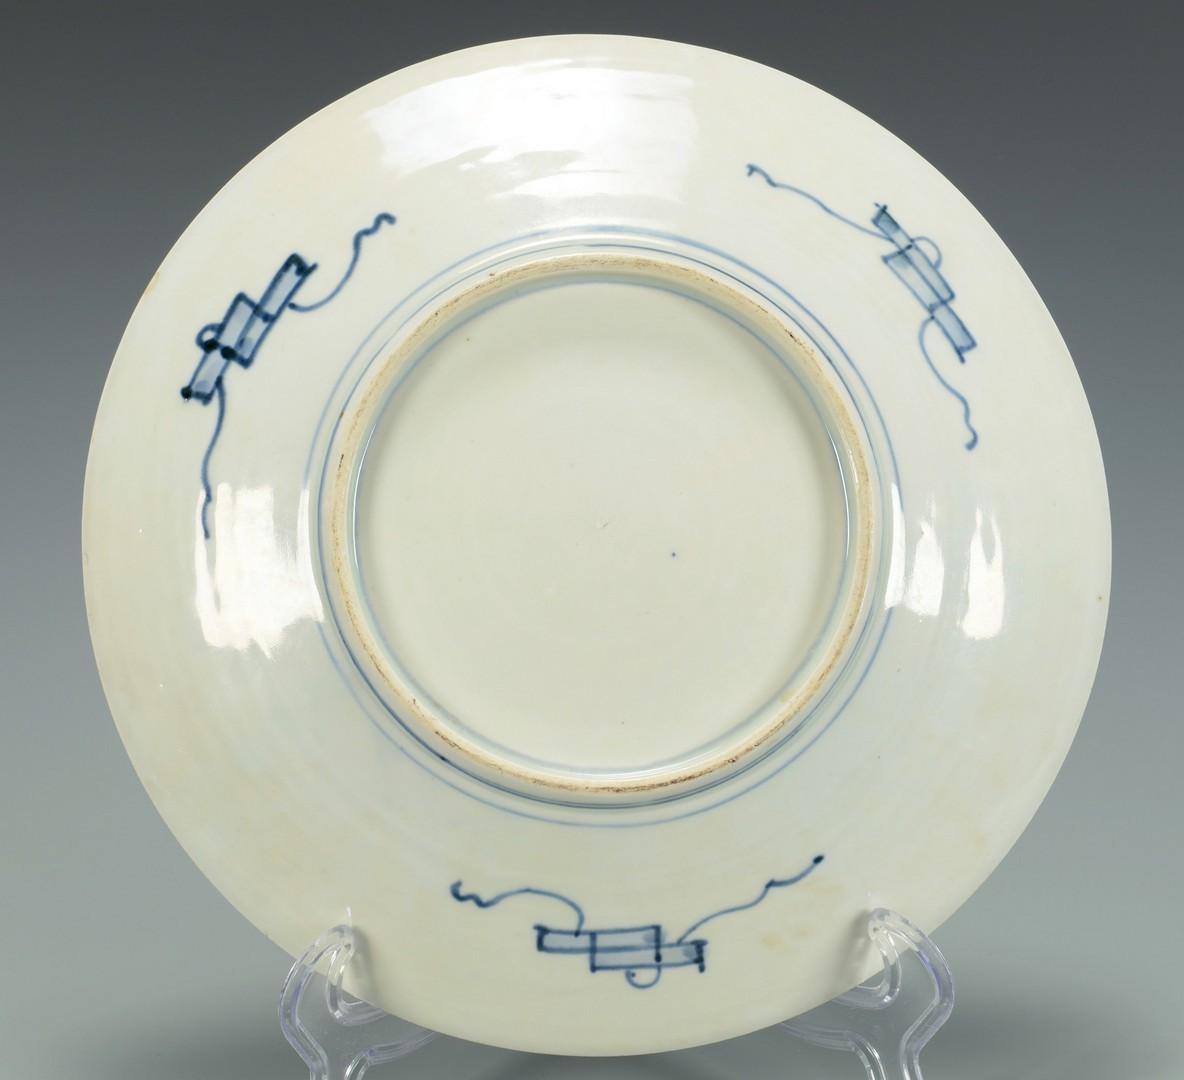 Lot 3383224: 3 Imari Porcelain Chargers